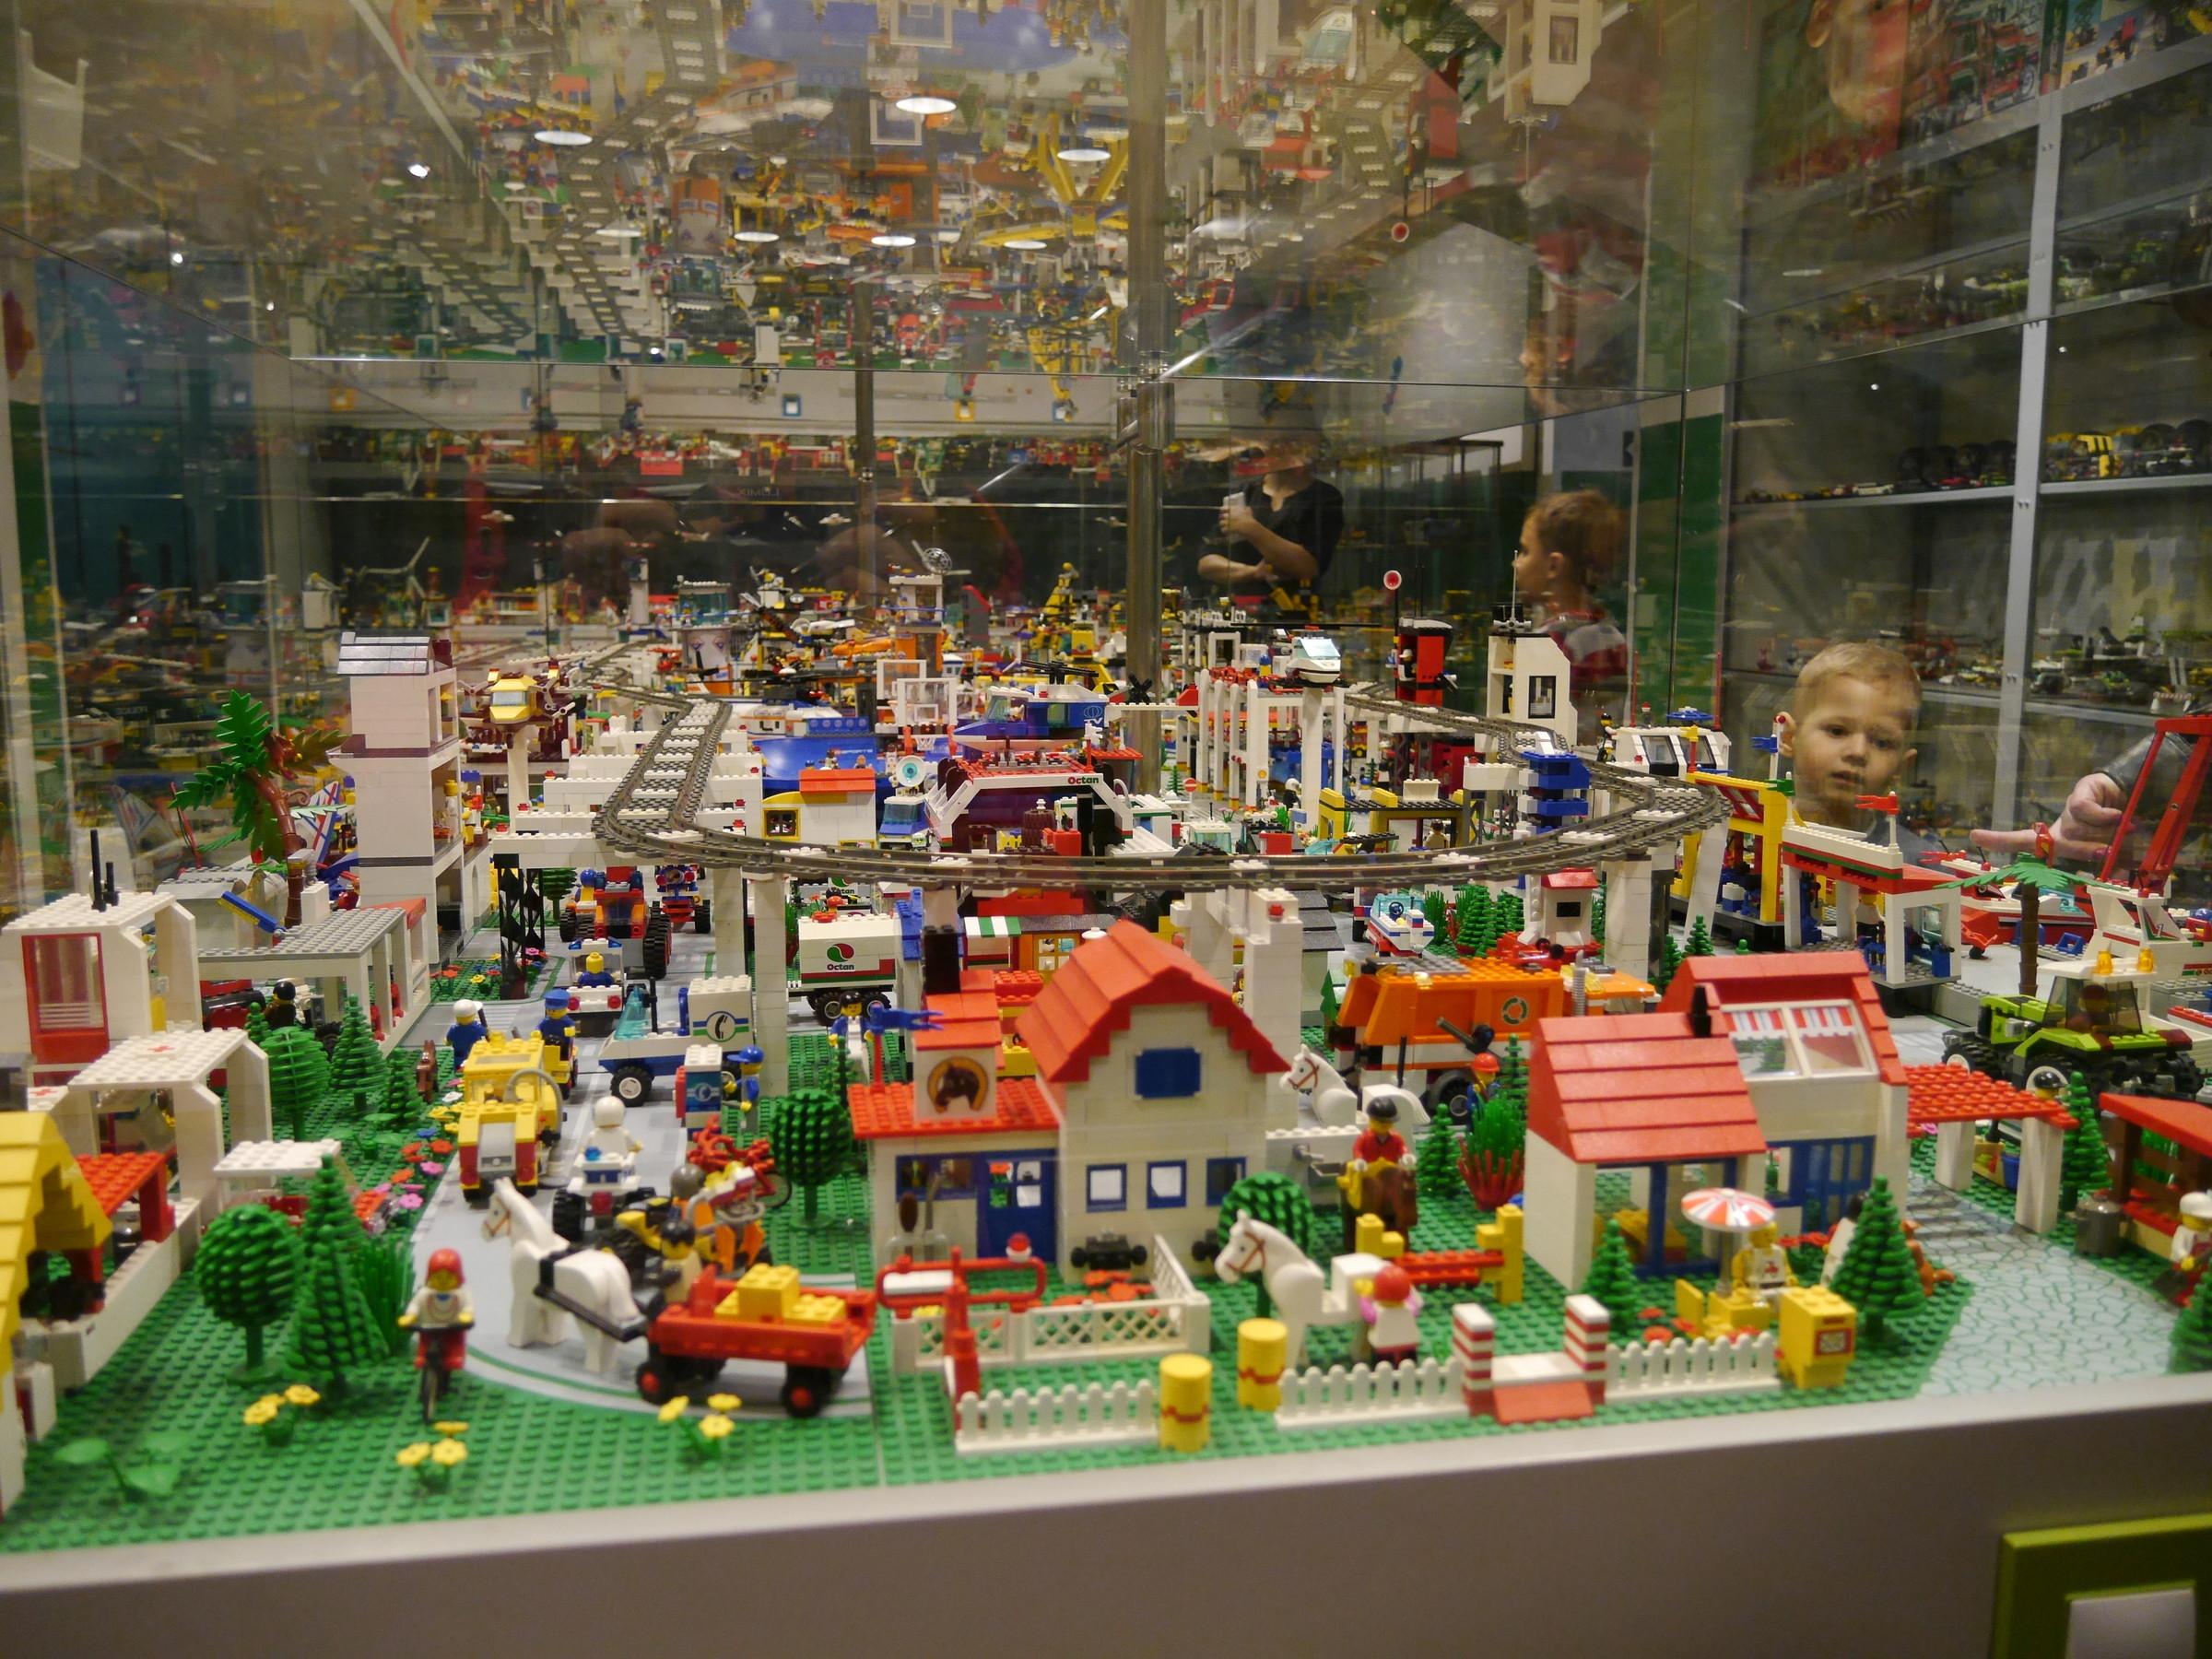 Музей игрушки новосибирск цена билета афиша театра неформат